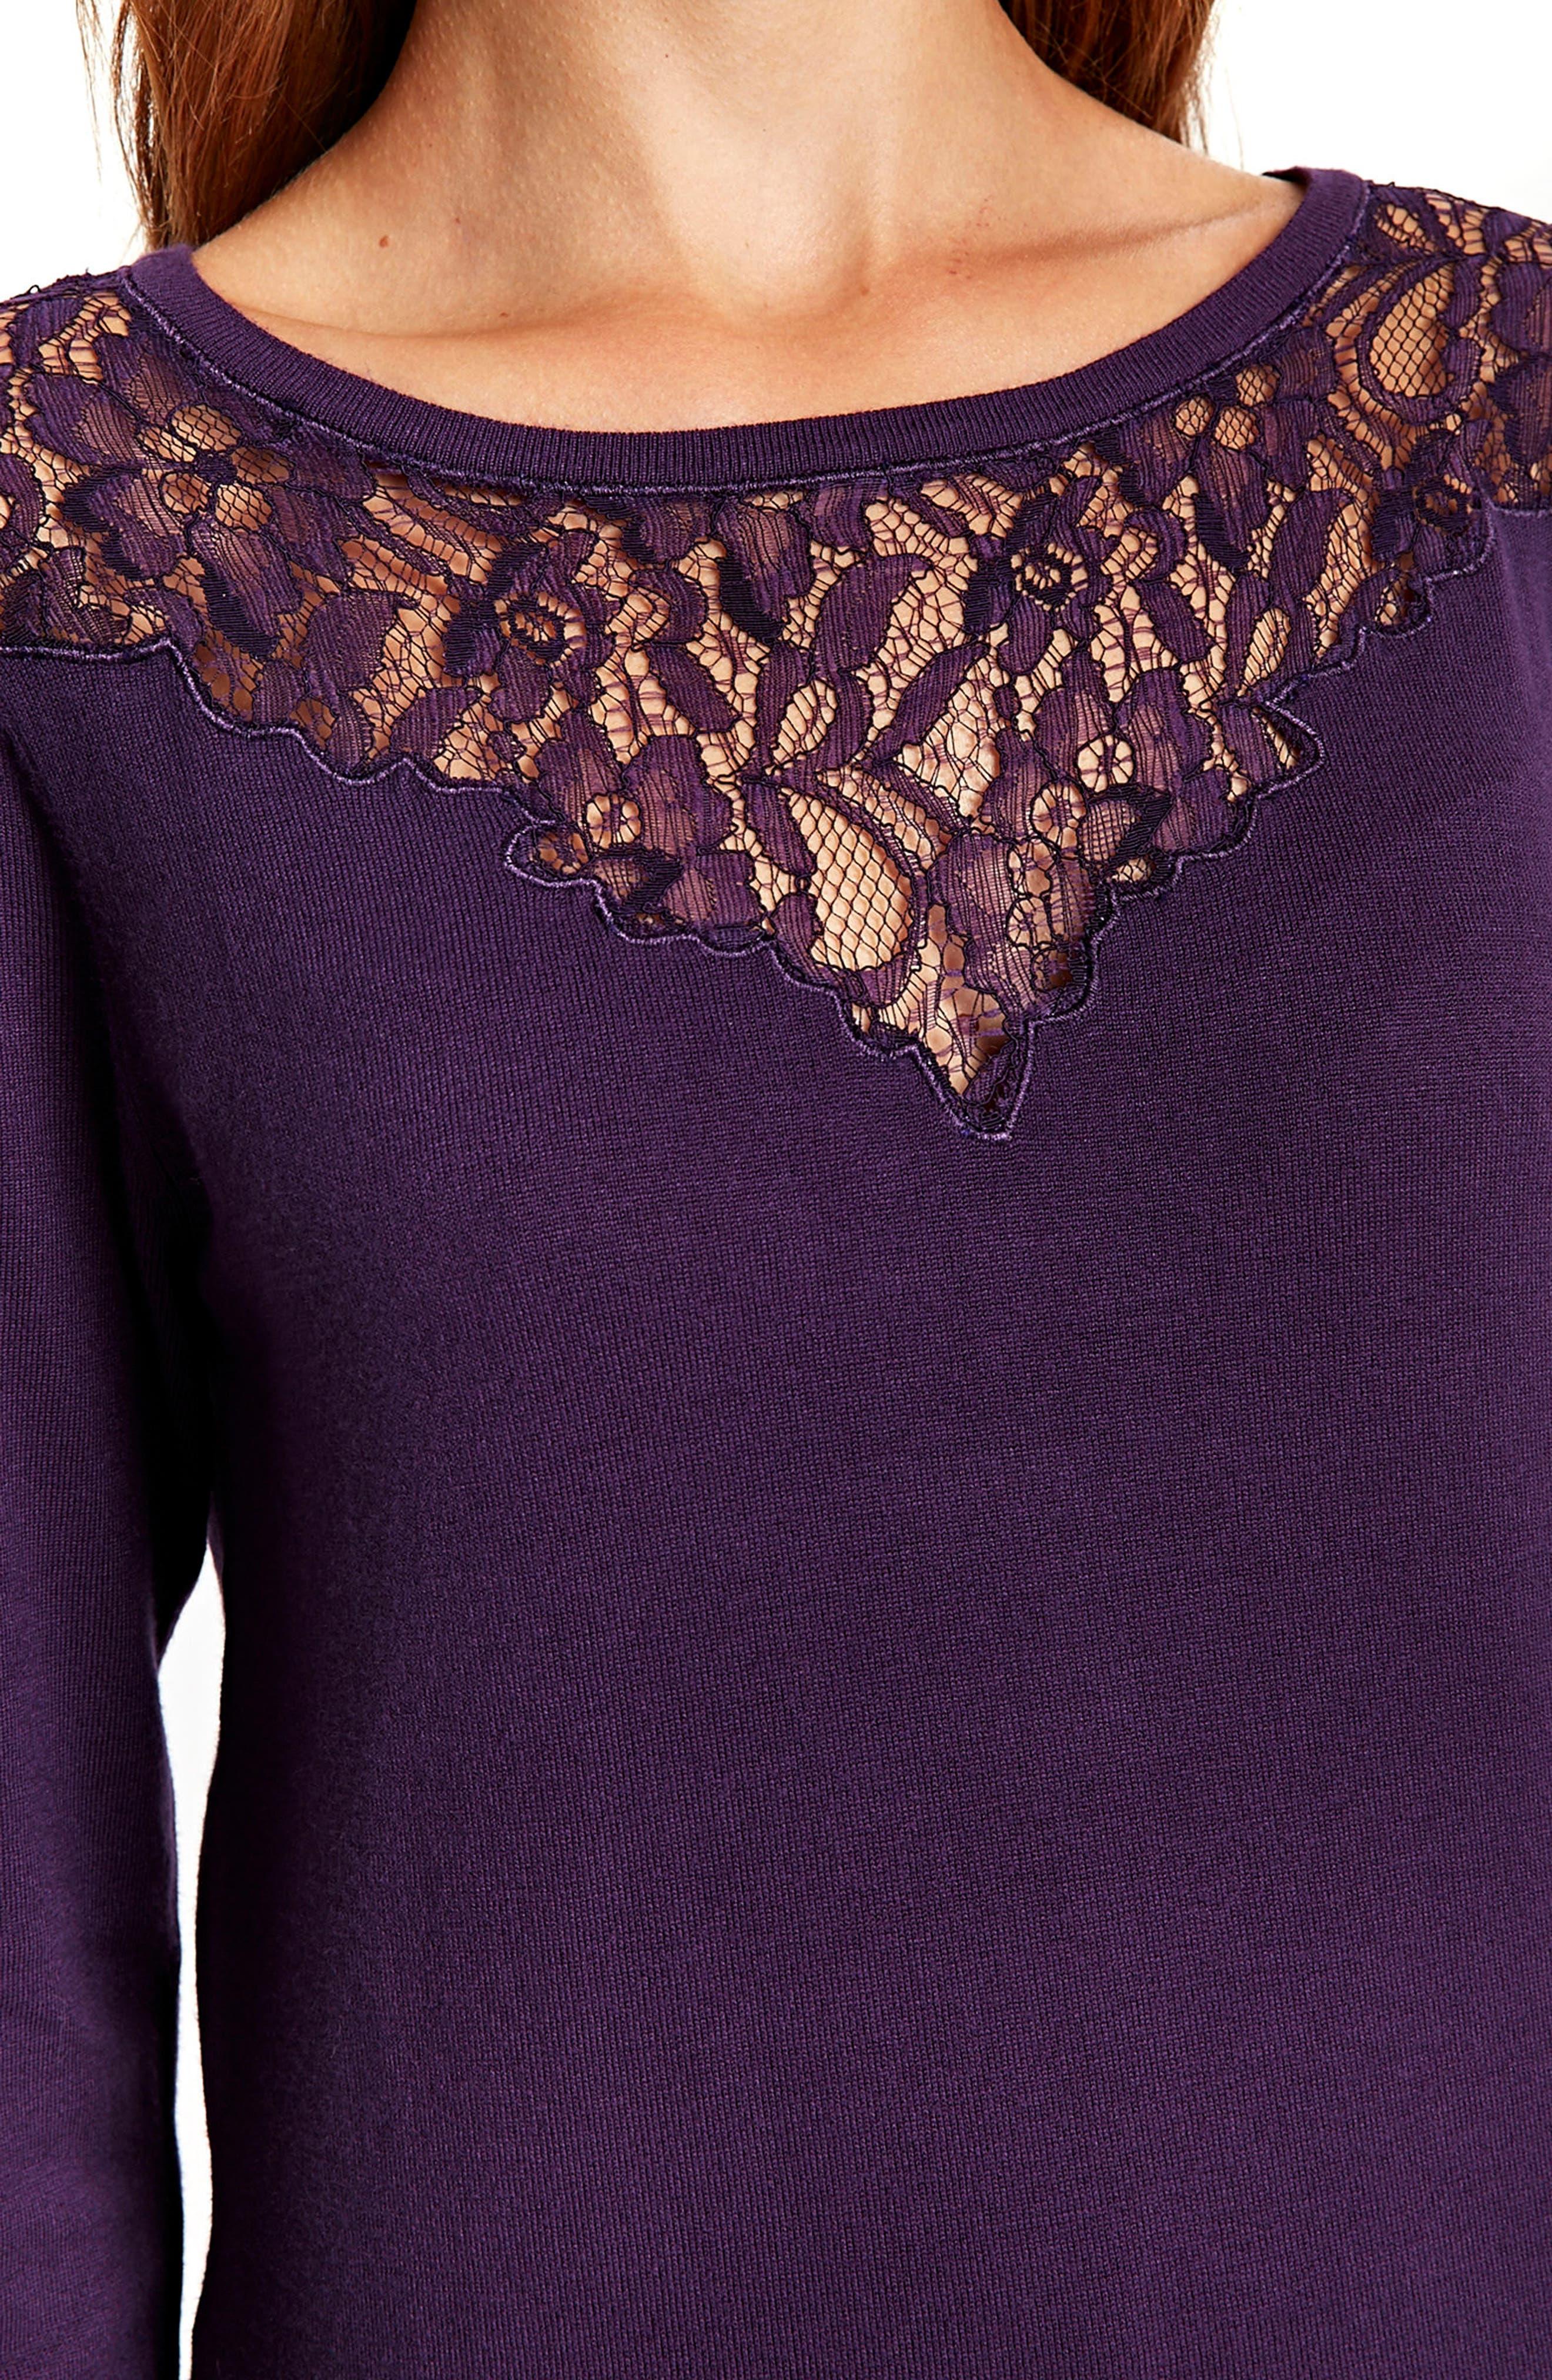 Lace Panel Shift Dress,                             Alternate thumbnail 6, color,